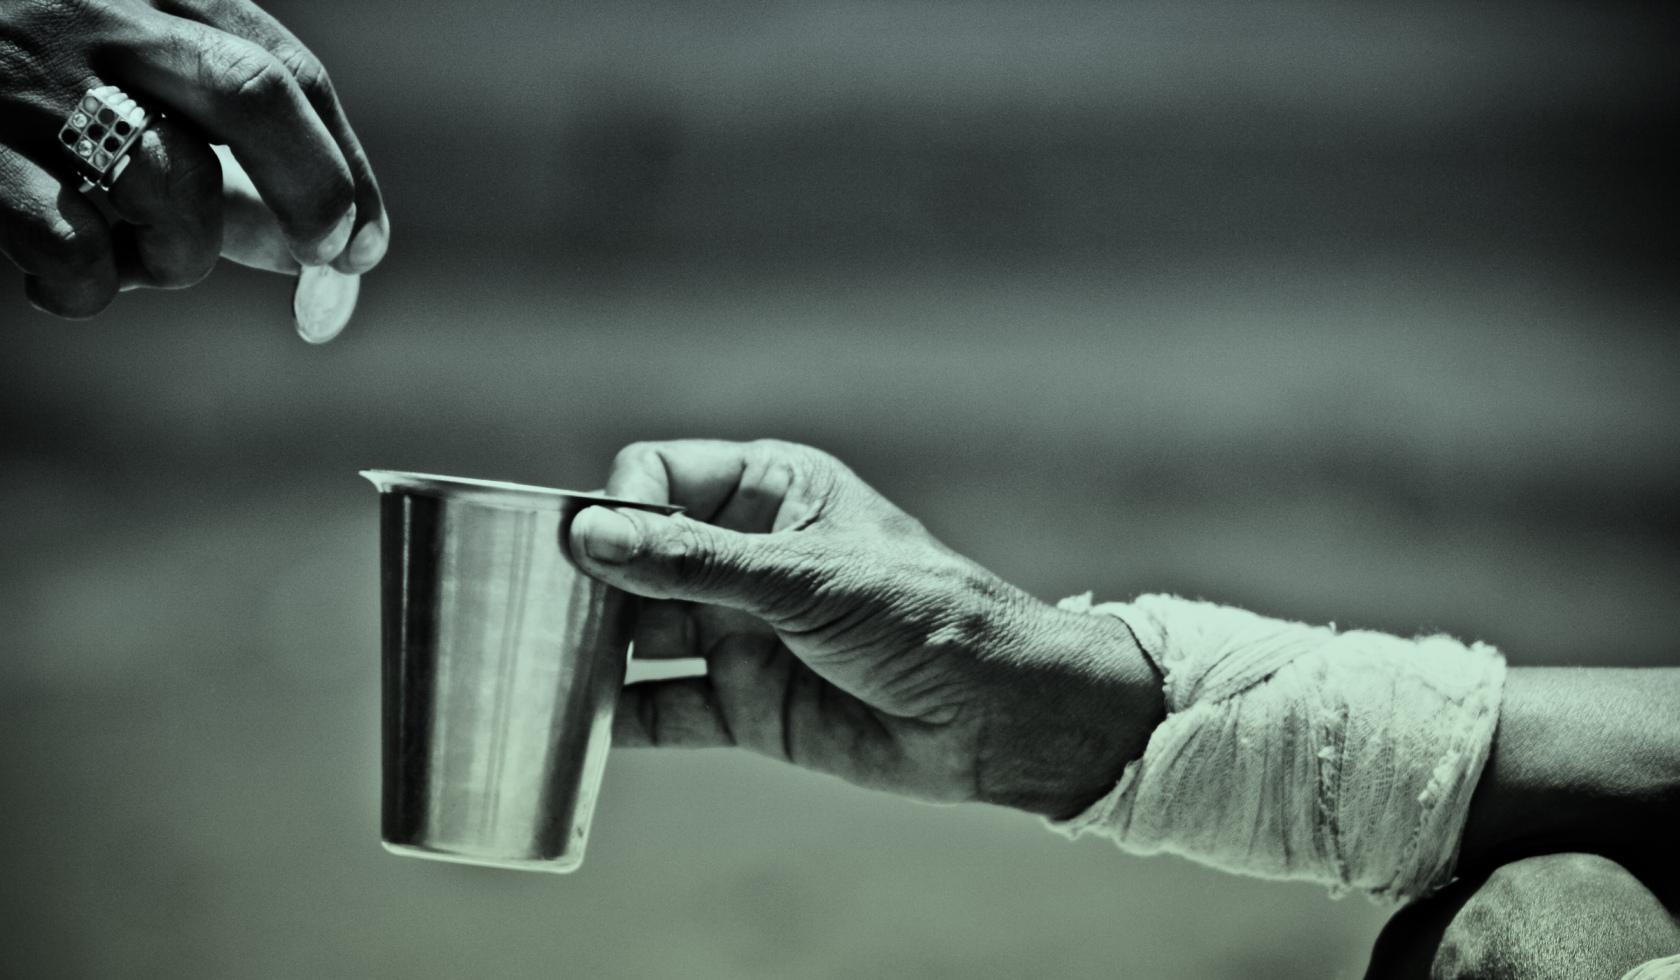 Macintosh HD:Users:brittanyloeffler:Downloads:Upwork:Homeless Man:money-to-homeless1.jpg